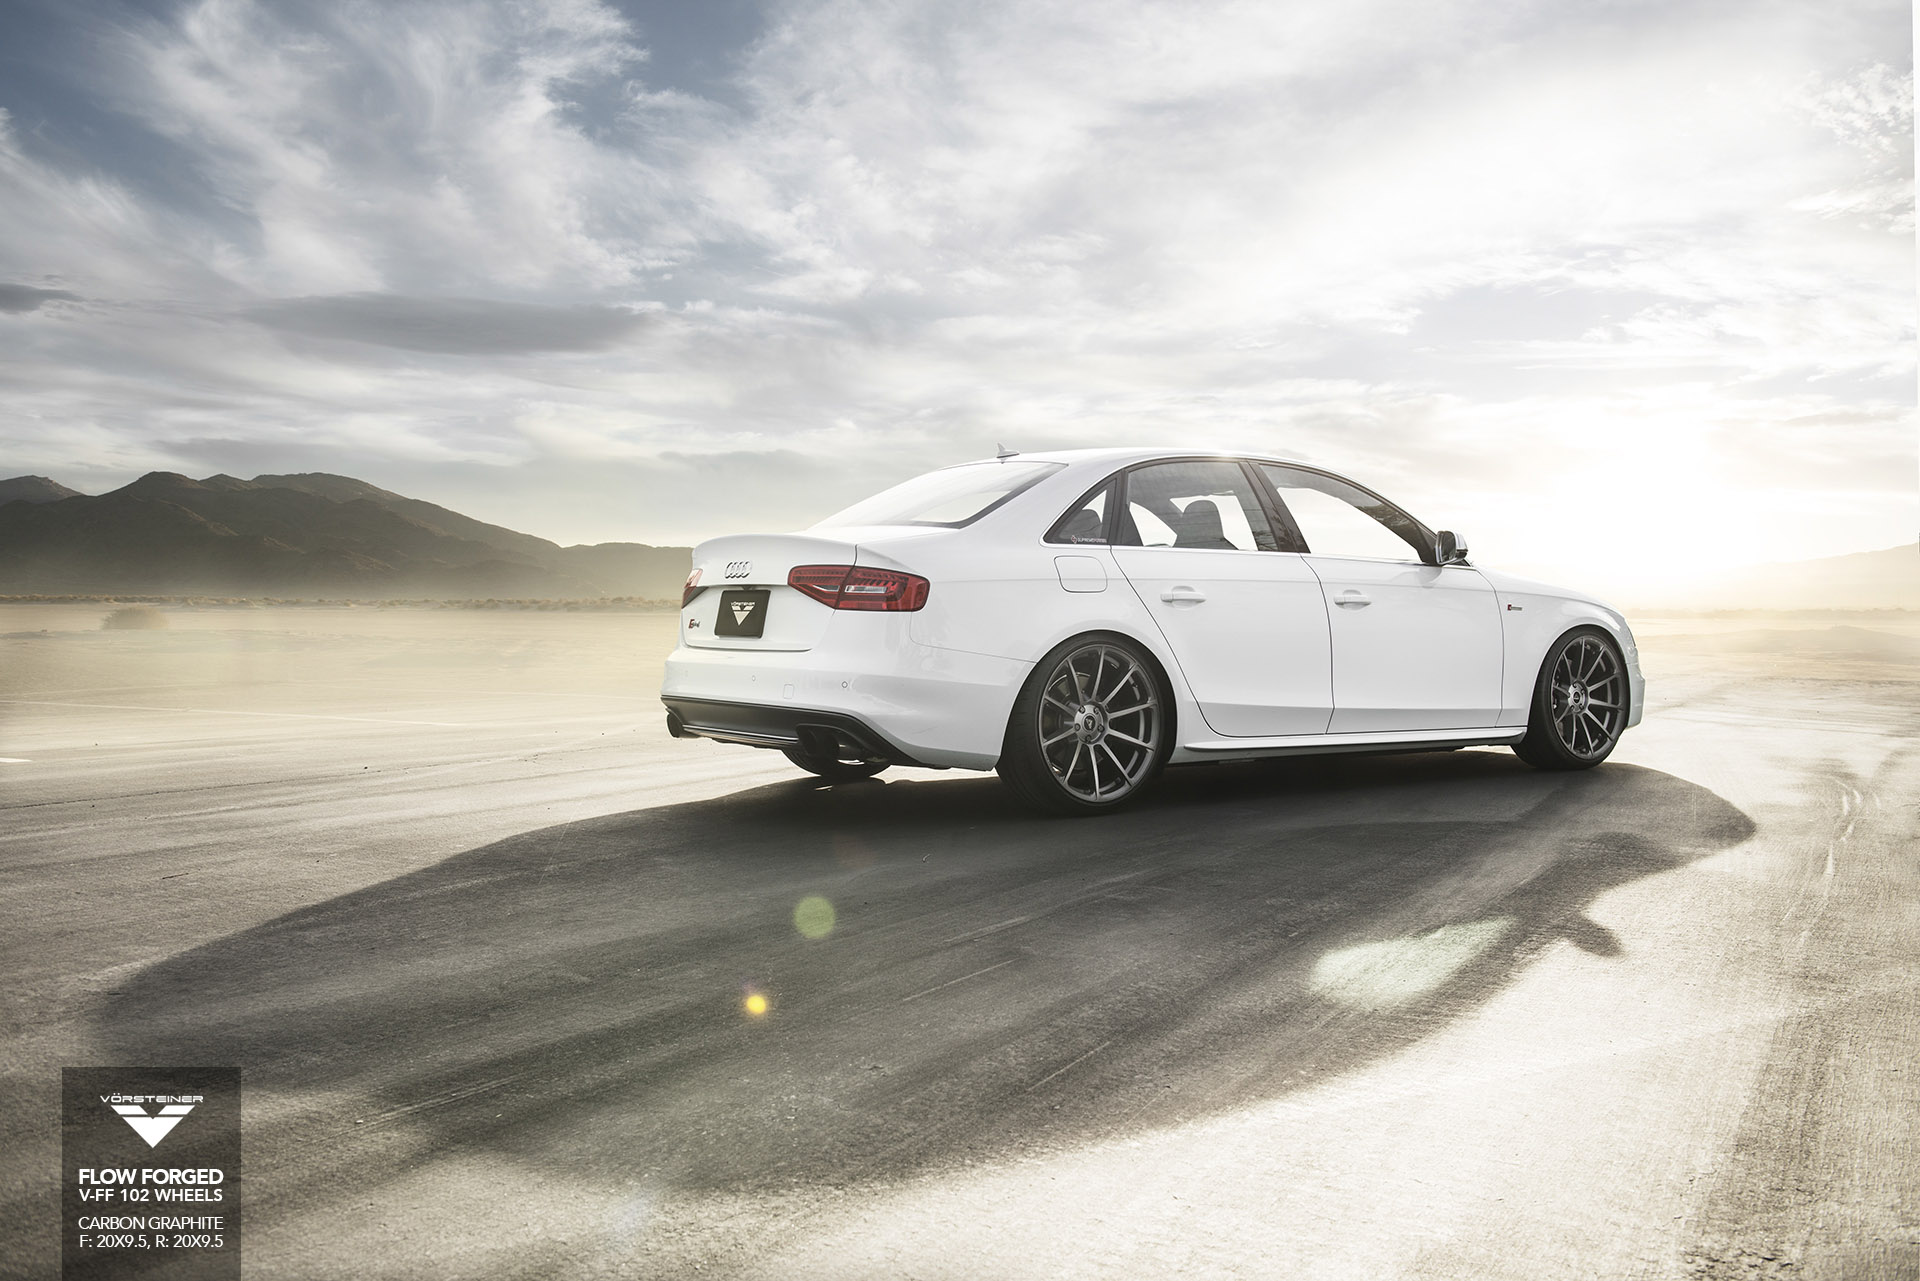 Audi A4 S4 Wheels Rims V Ff 102 Flow Forged Wheels Custom Rims Vorsteiner Wheels